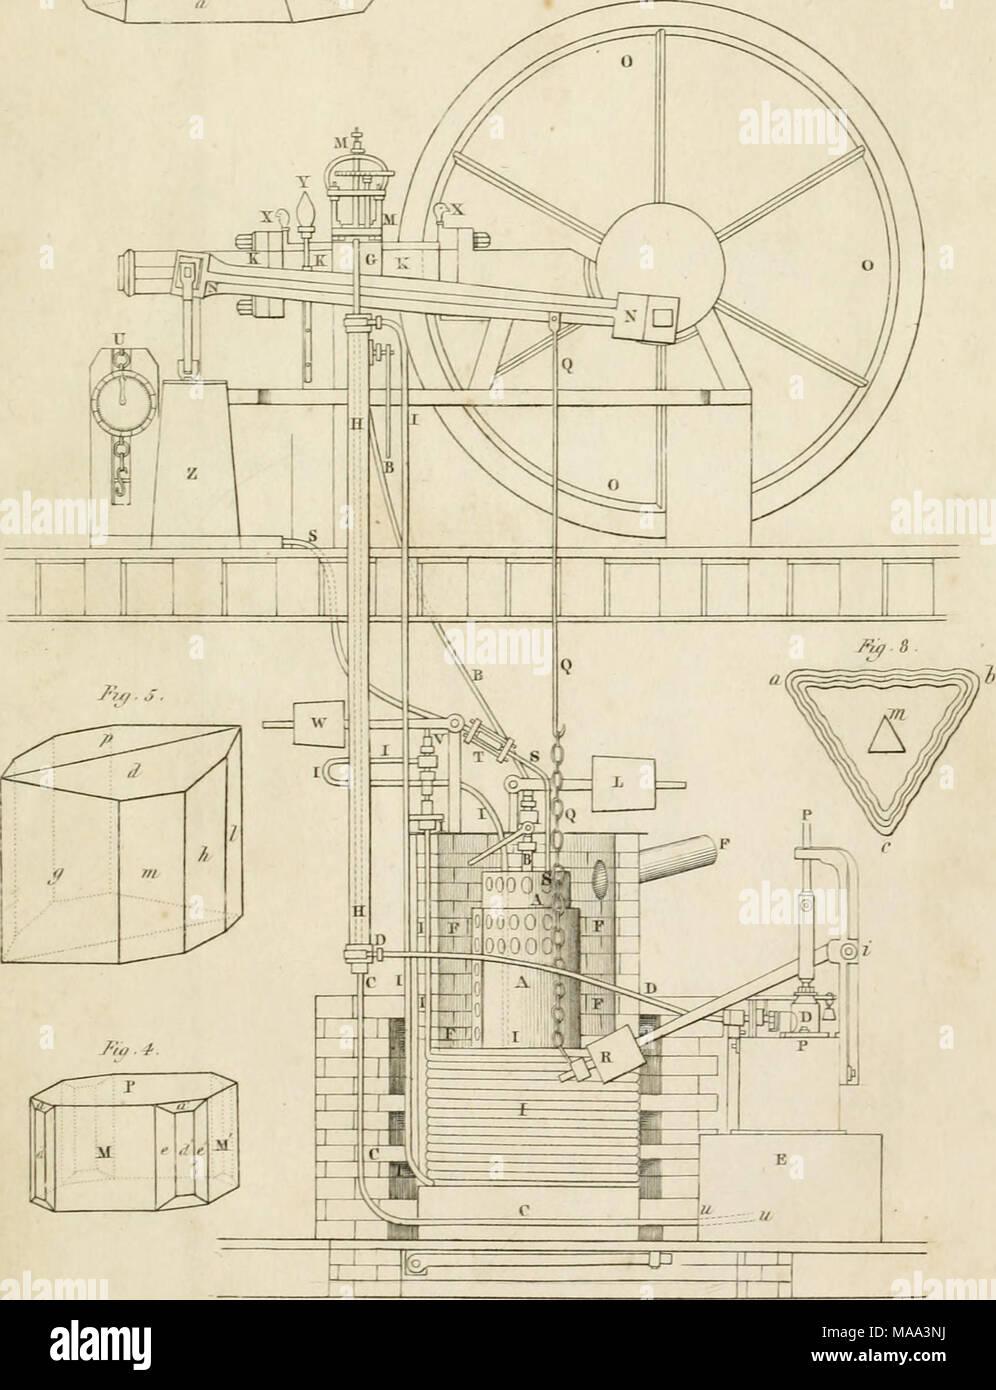 . The Edinburgh journal of science. v. 1-10, July 1824-Apr. 1829; new ser., v. 1-6, July 1829-Apr. 1832 . J'tth/is/ird ^'/ W.mH-Ayr4Hf*i Stock Photo